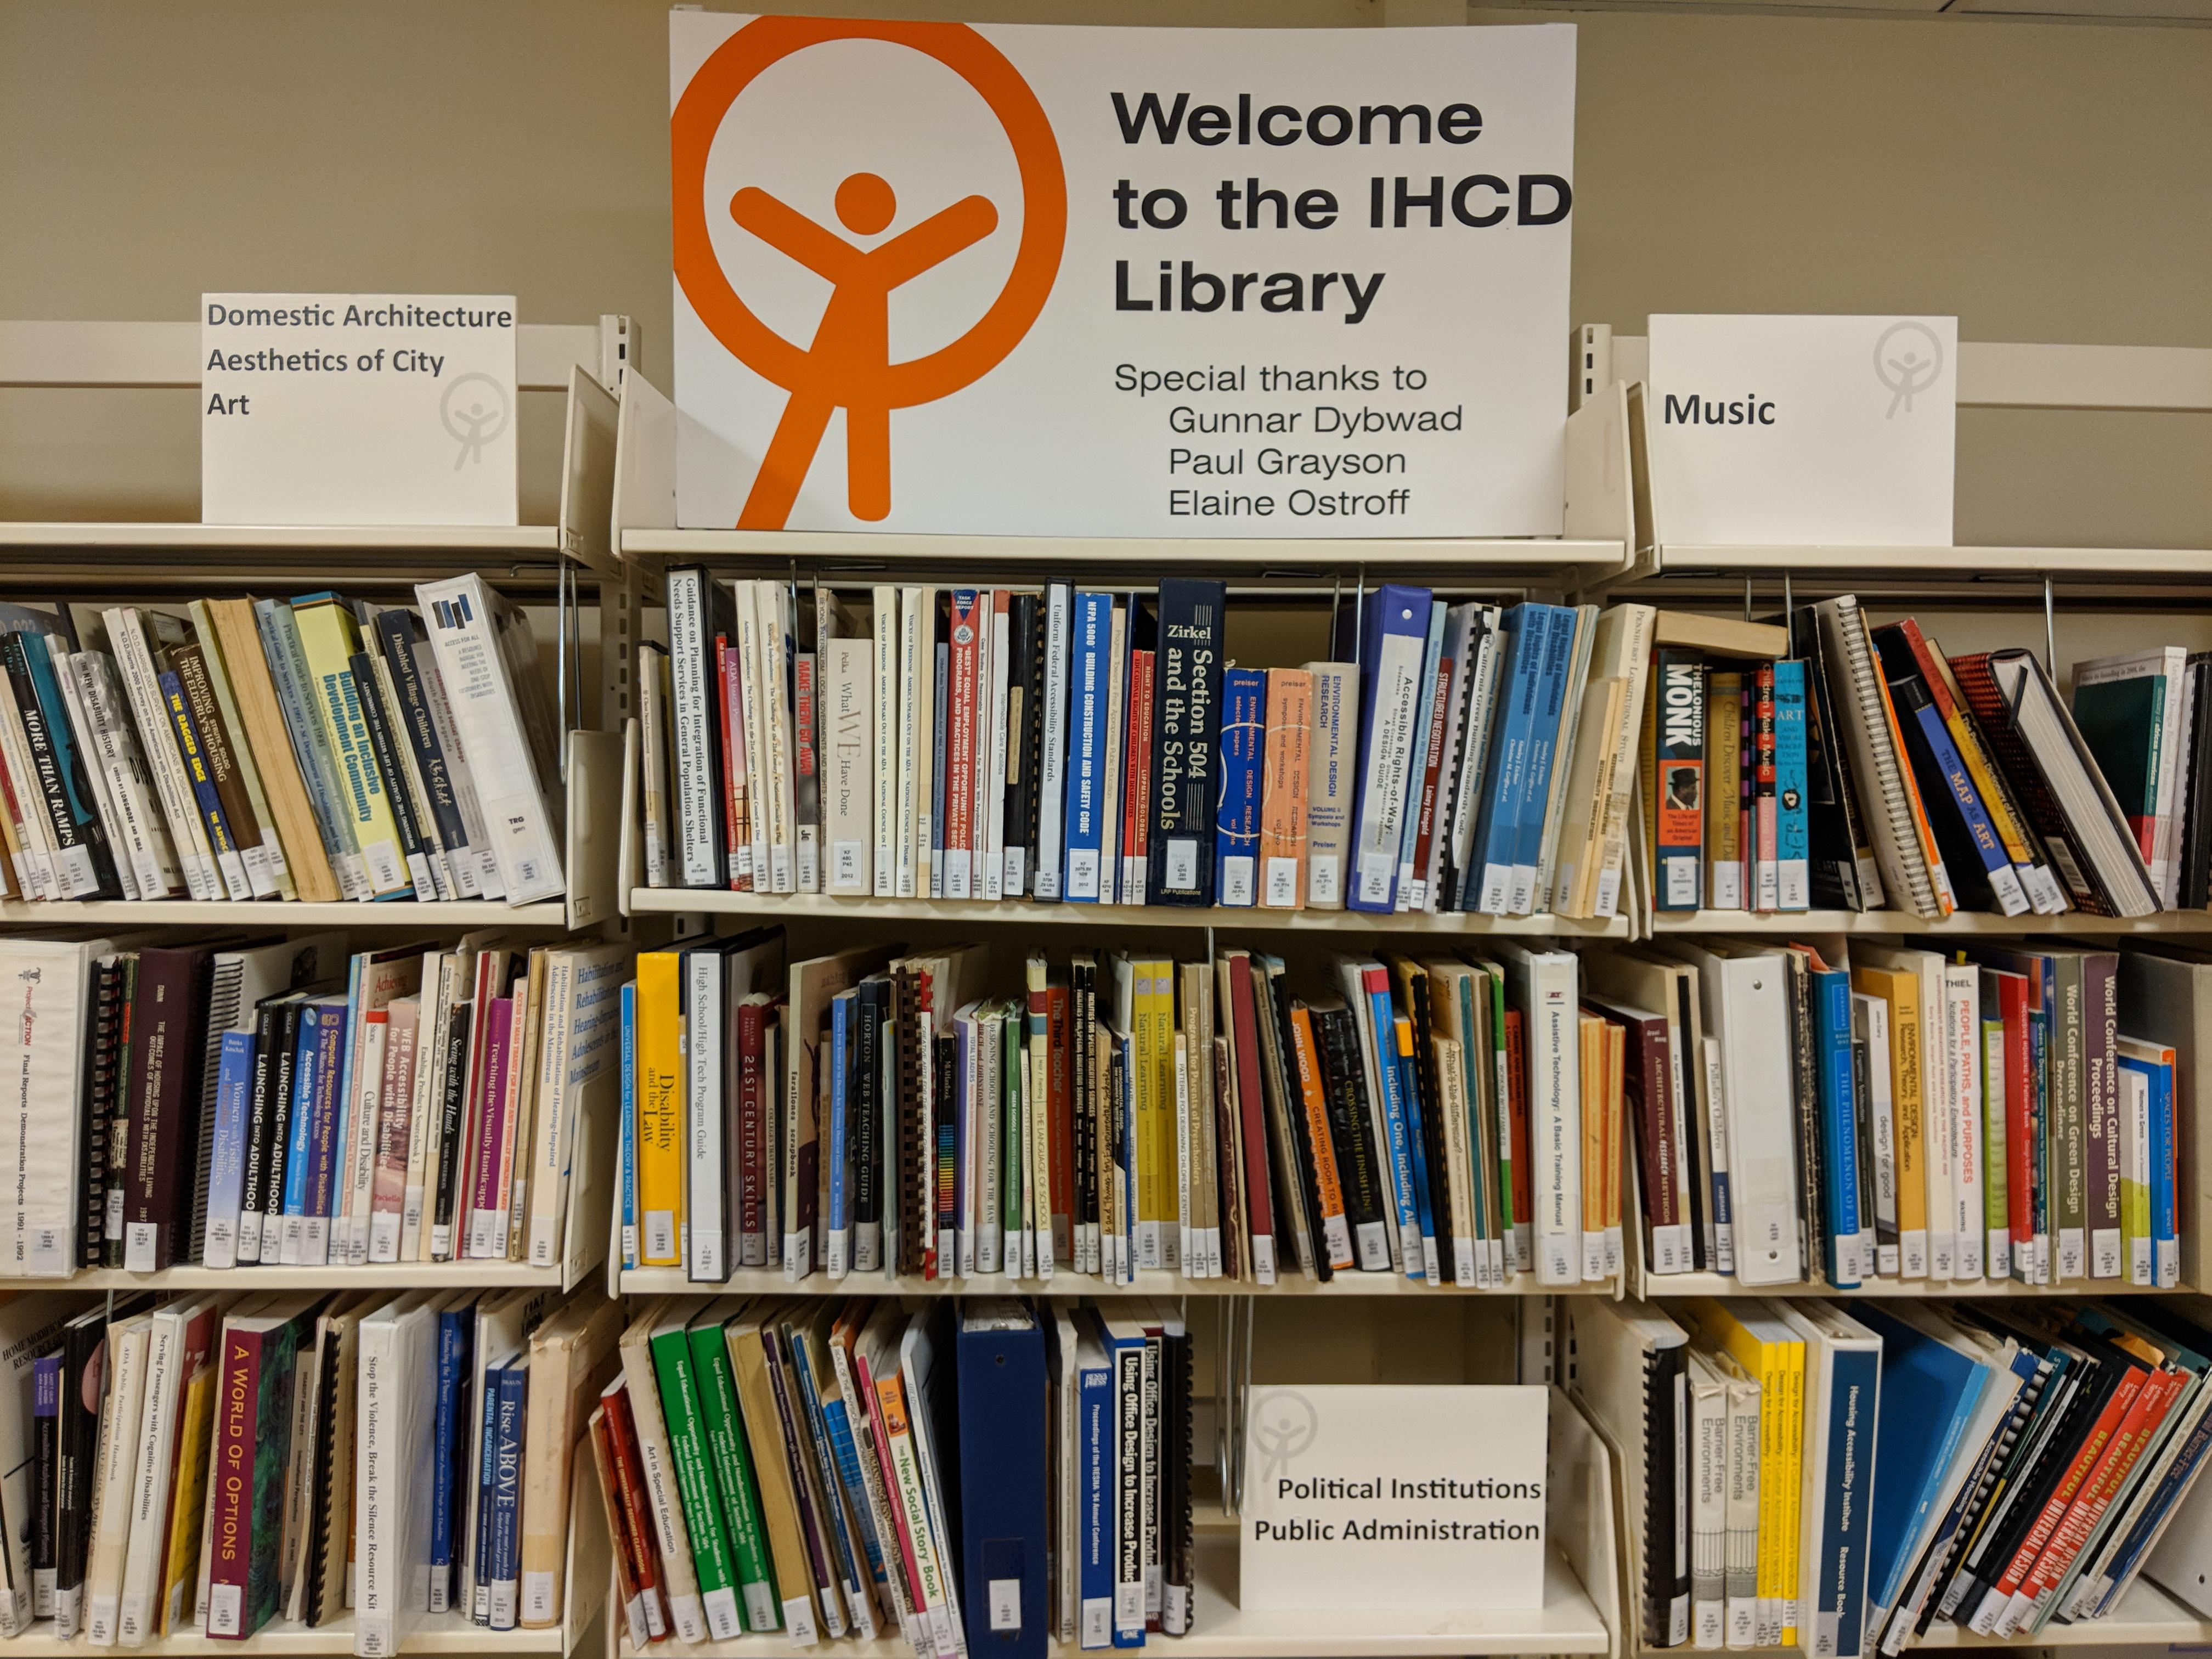 IHCD library